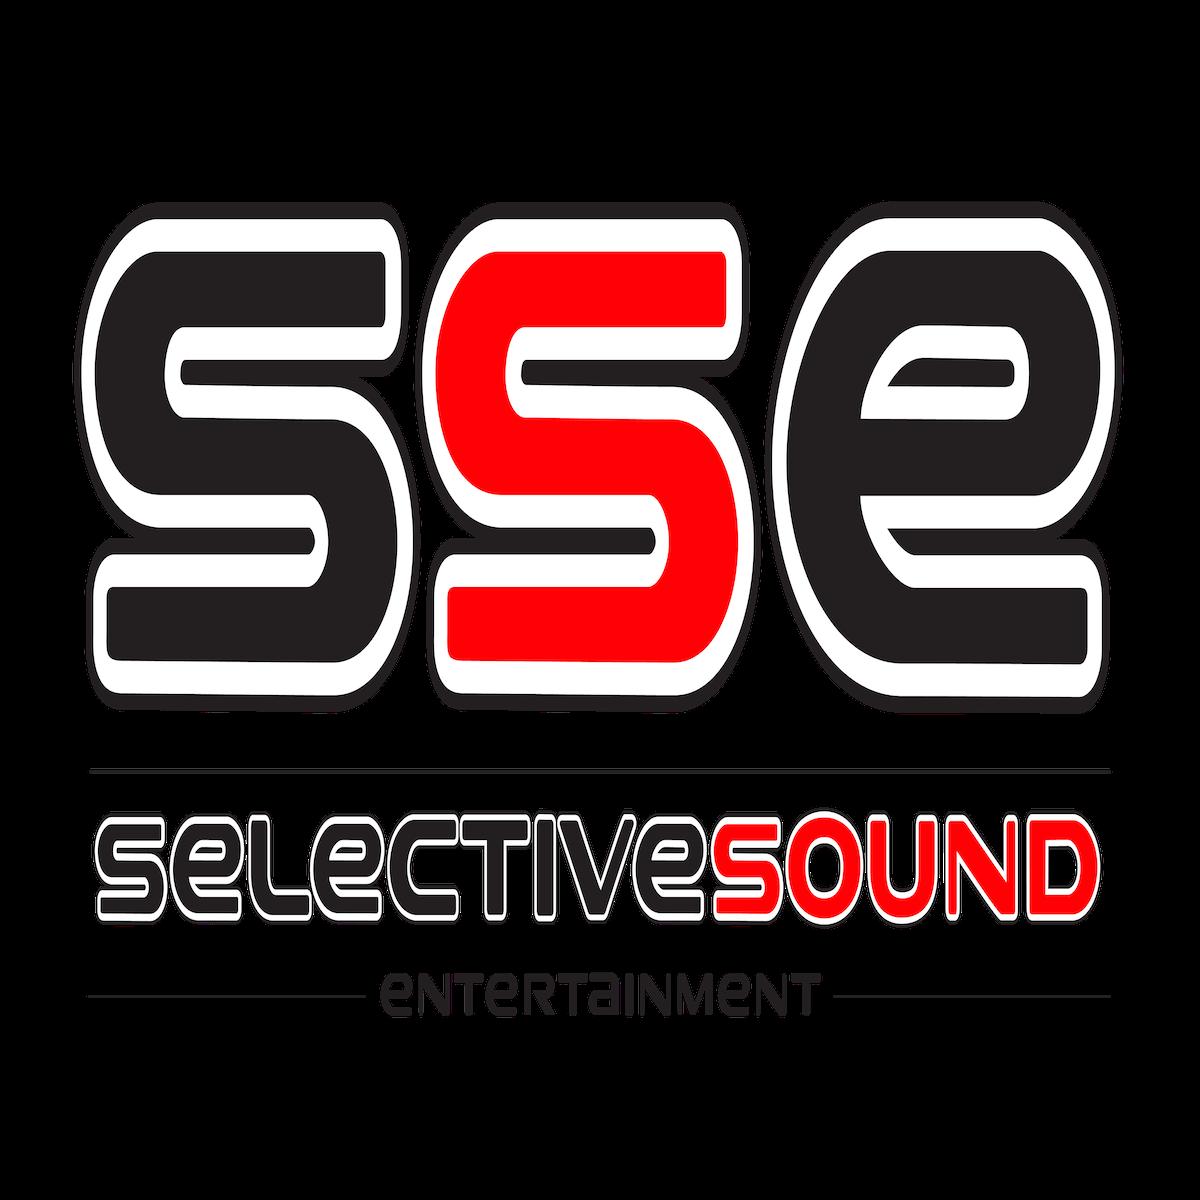 Selective Sound Entertainment